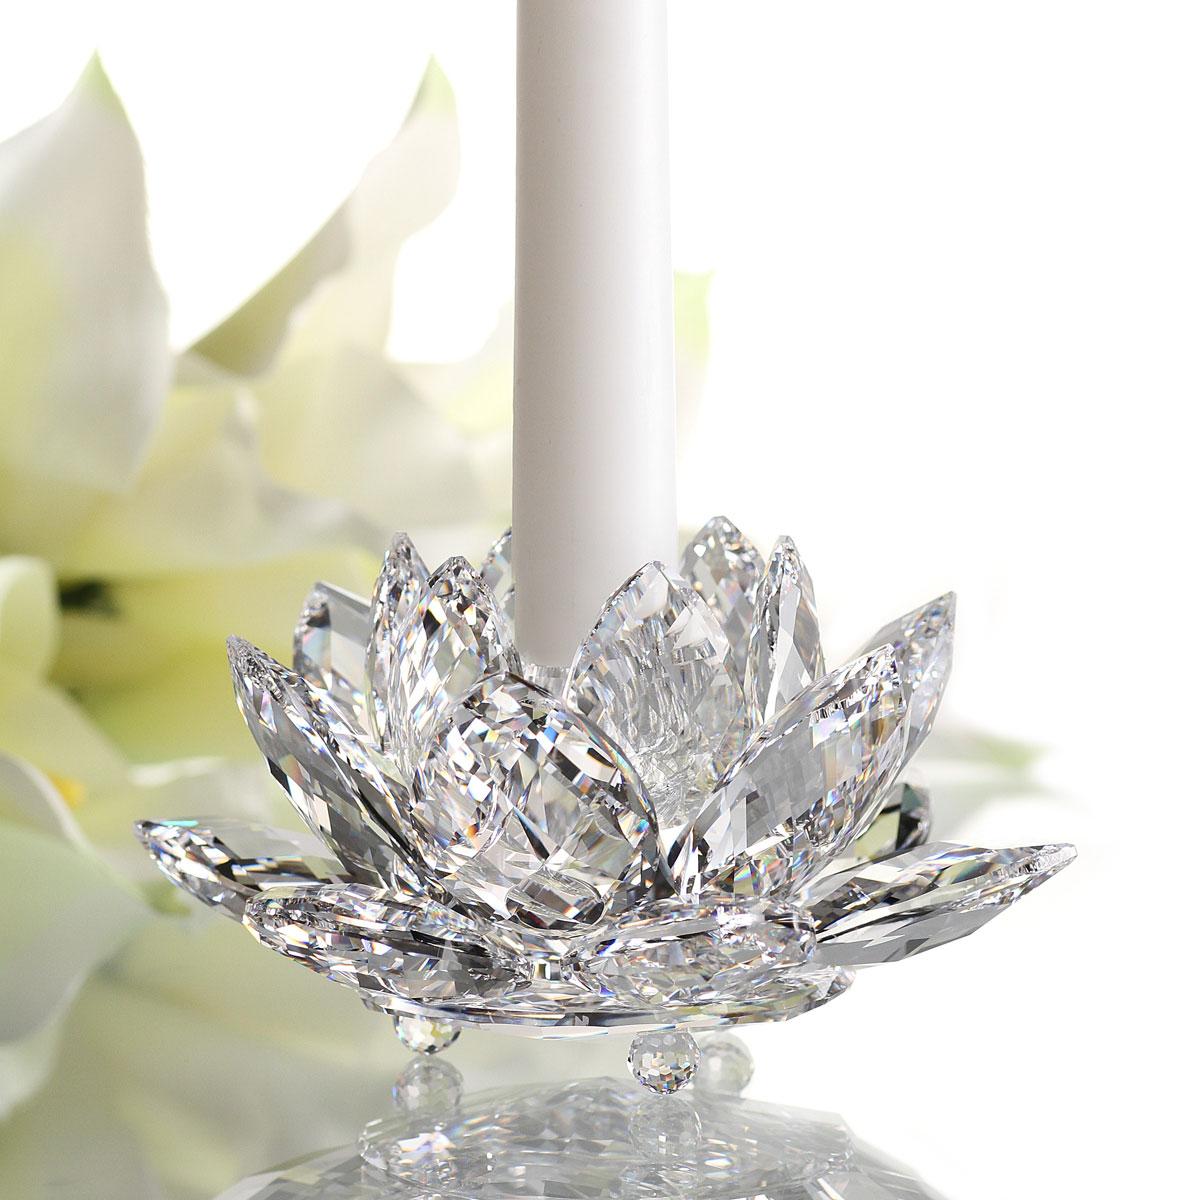 Swarovski Crystal Waterlilly Crystal Candleholder Large